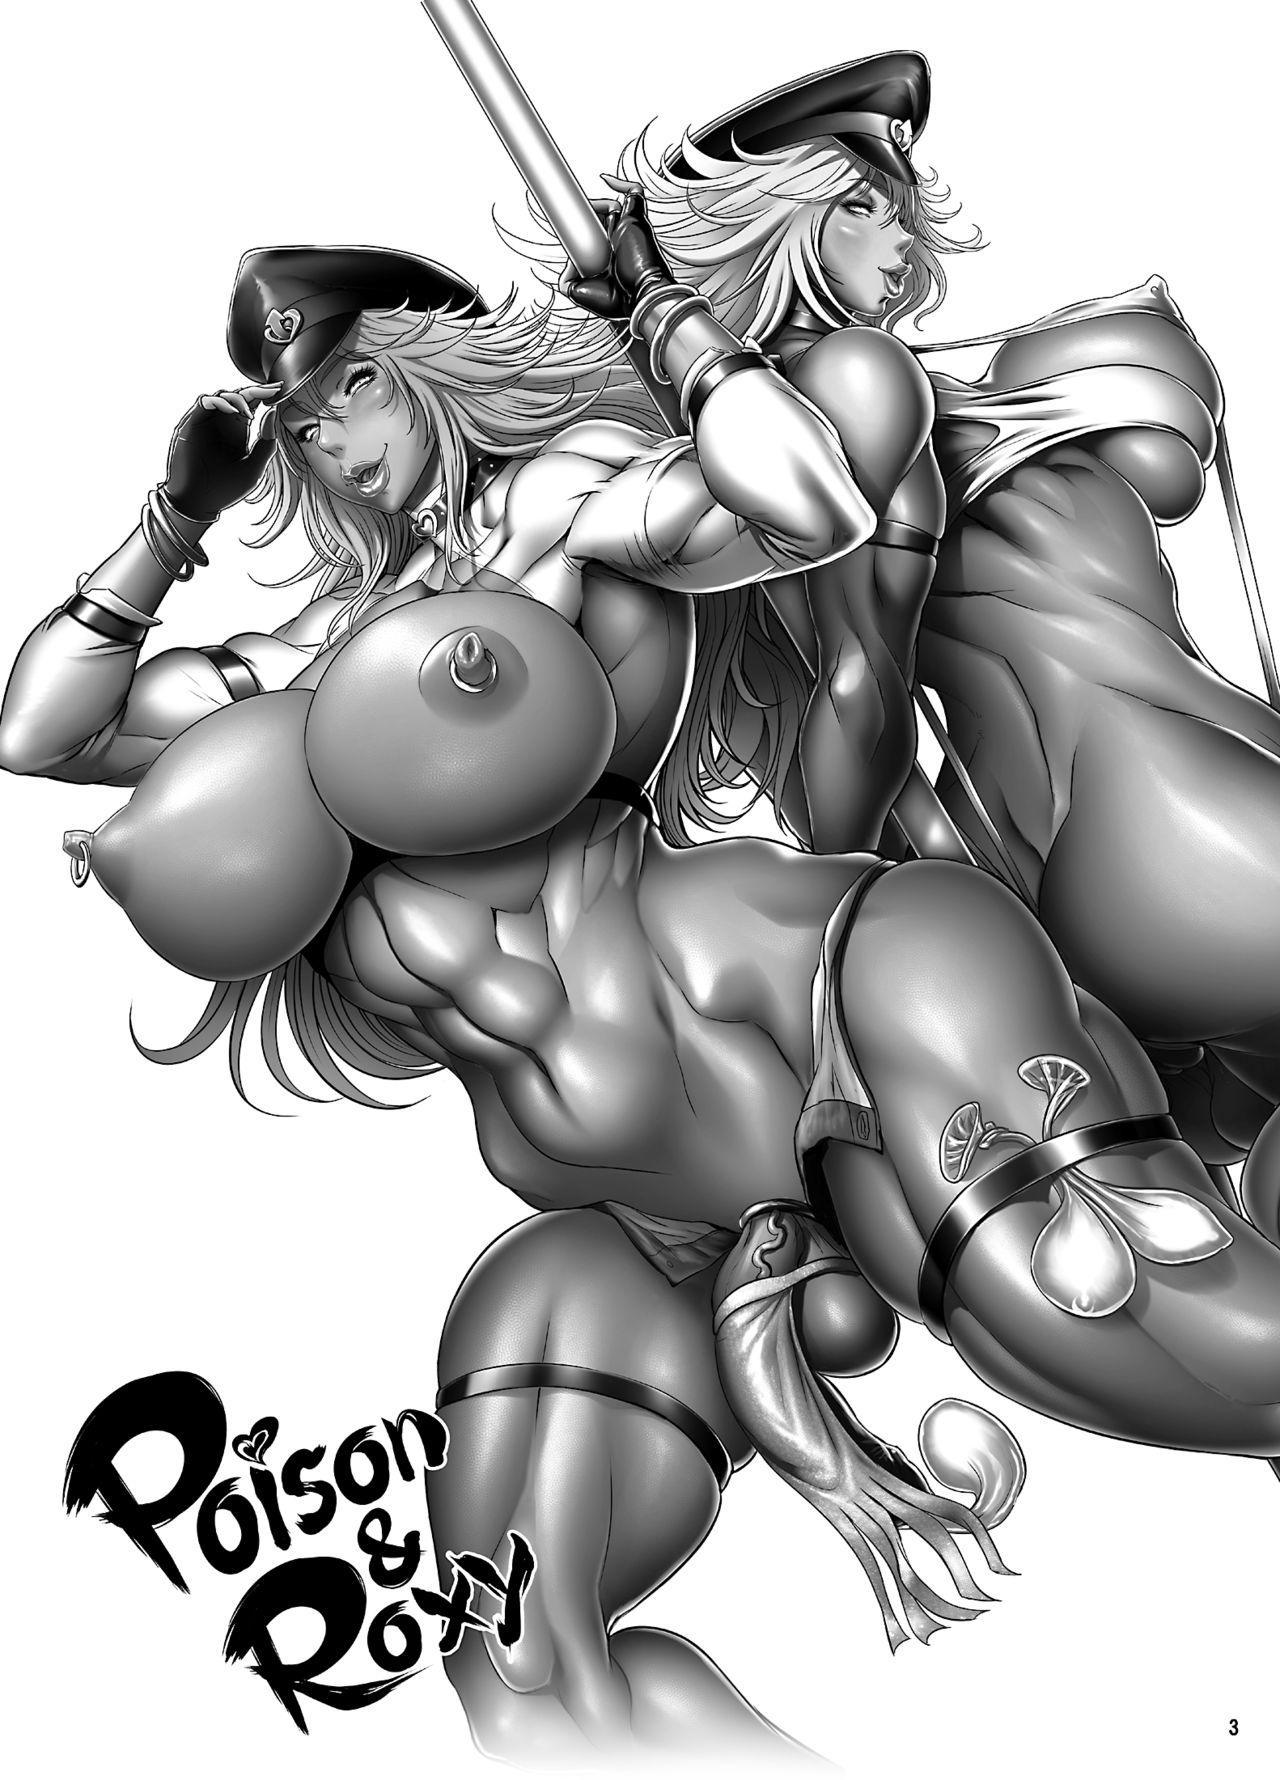 Poison&Roxy 1